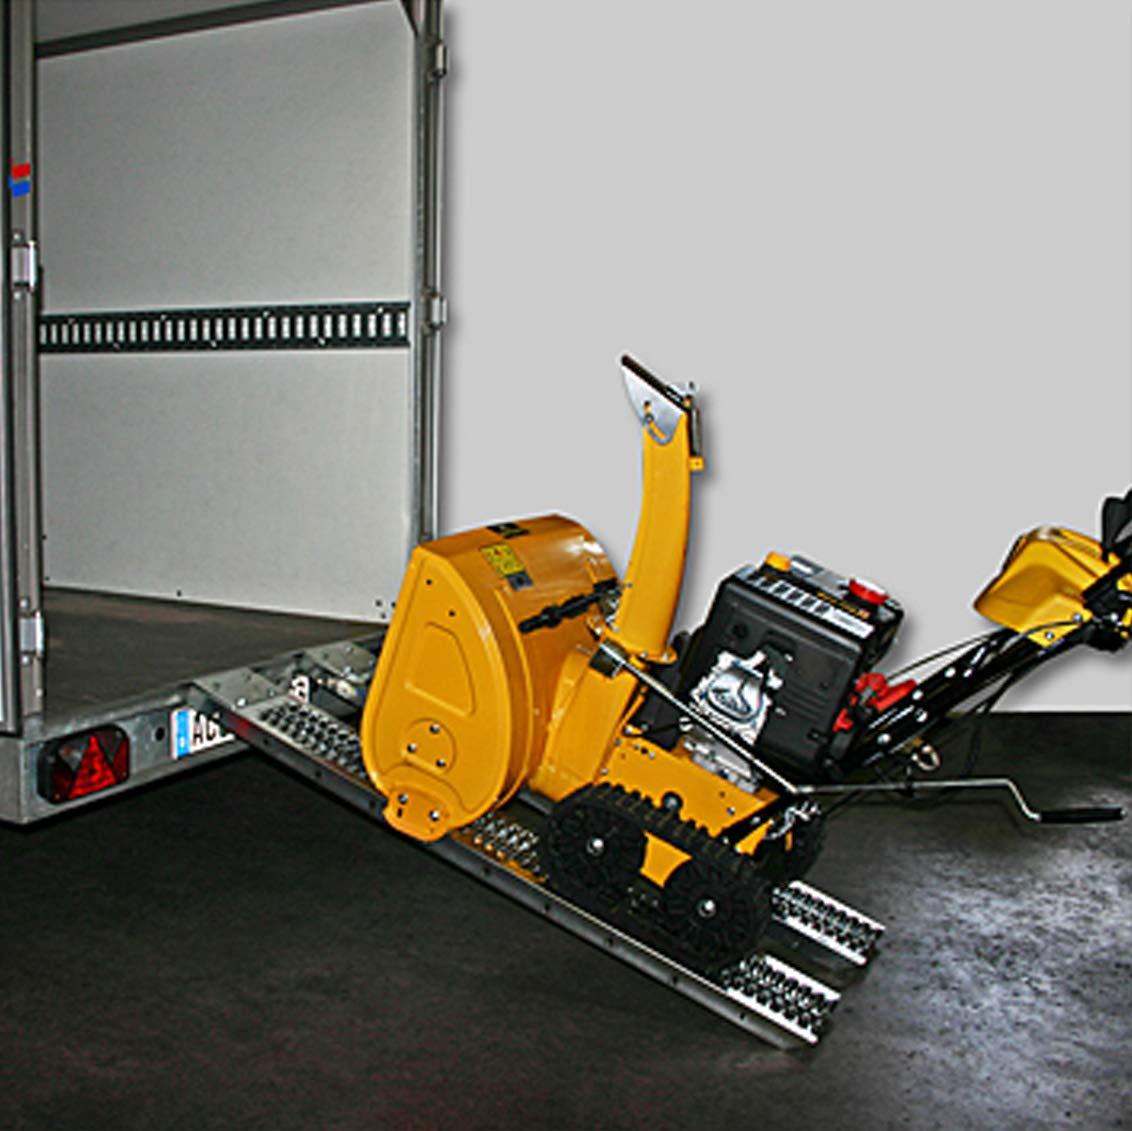 WilTec Rampa de Carga Acero hasta 450kg Doble Carril Maquinas Segadora Tractor Remolque Motocultor